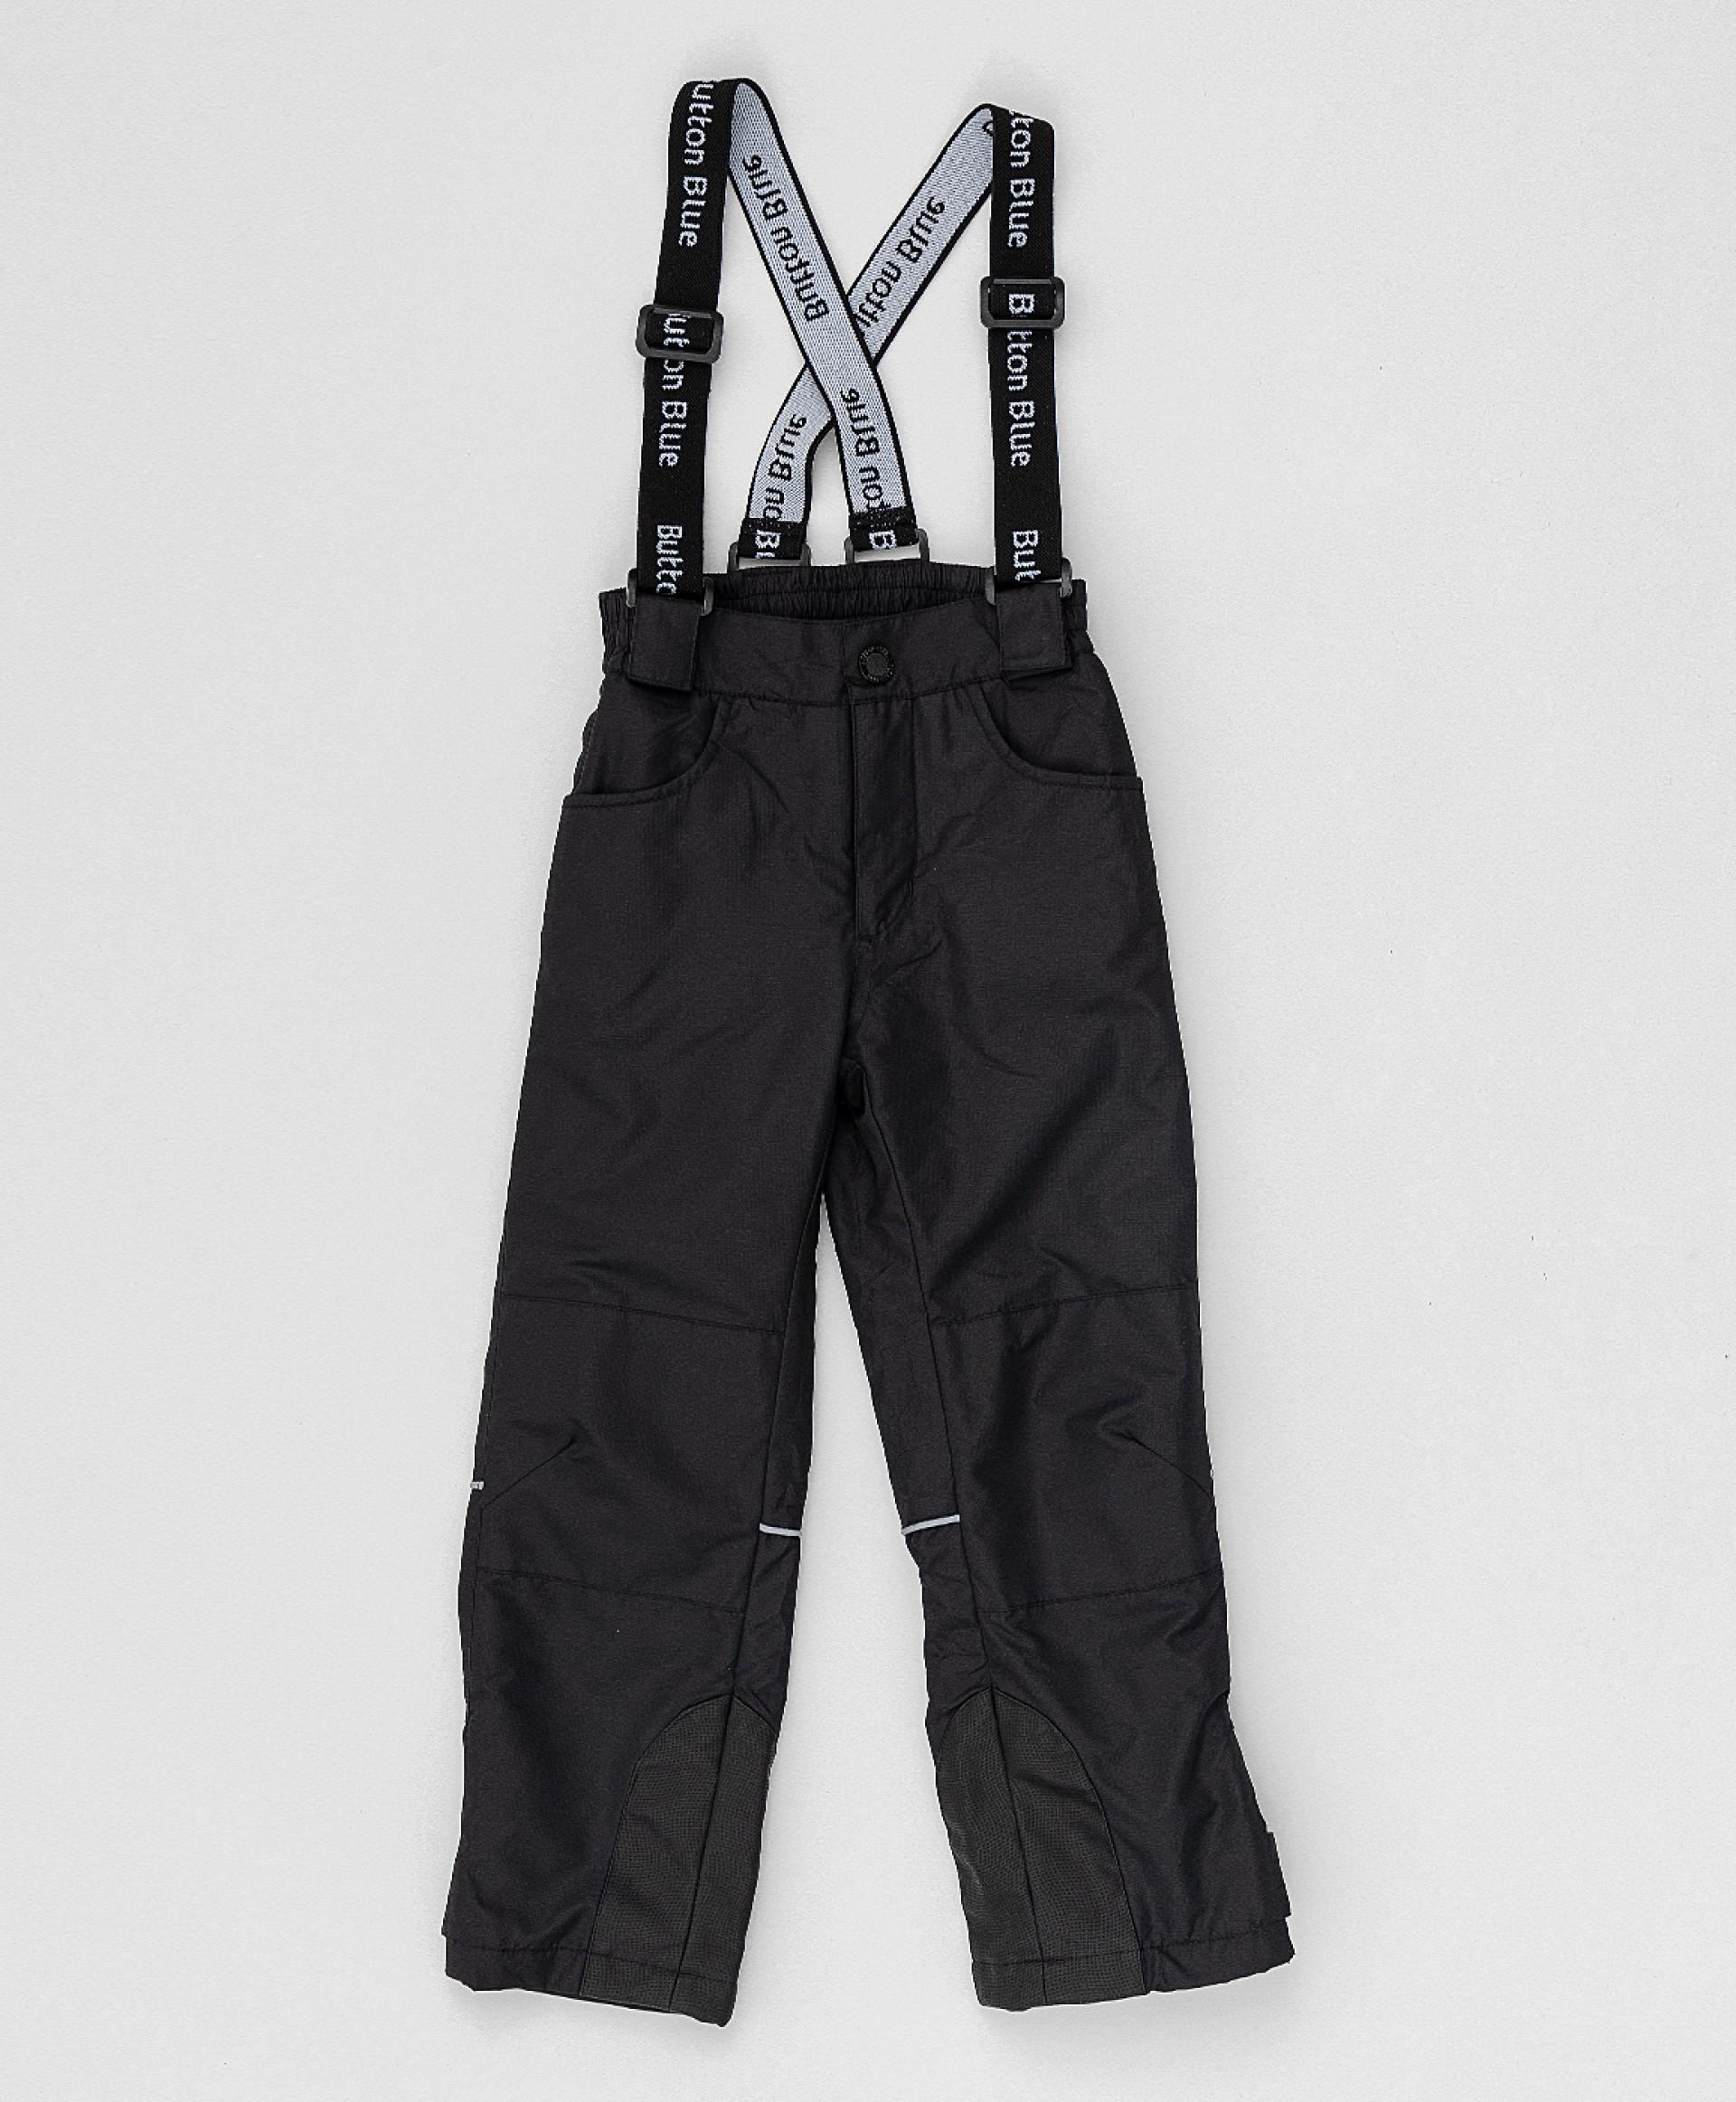 Демисезонные брюки Active Button Blue, размер 98 220BBGA64010800